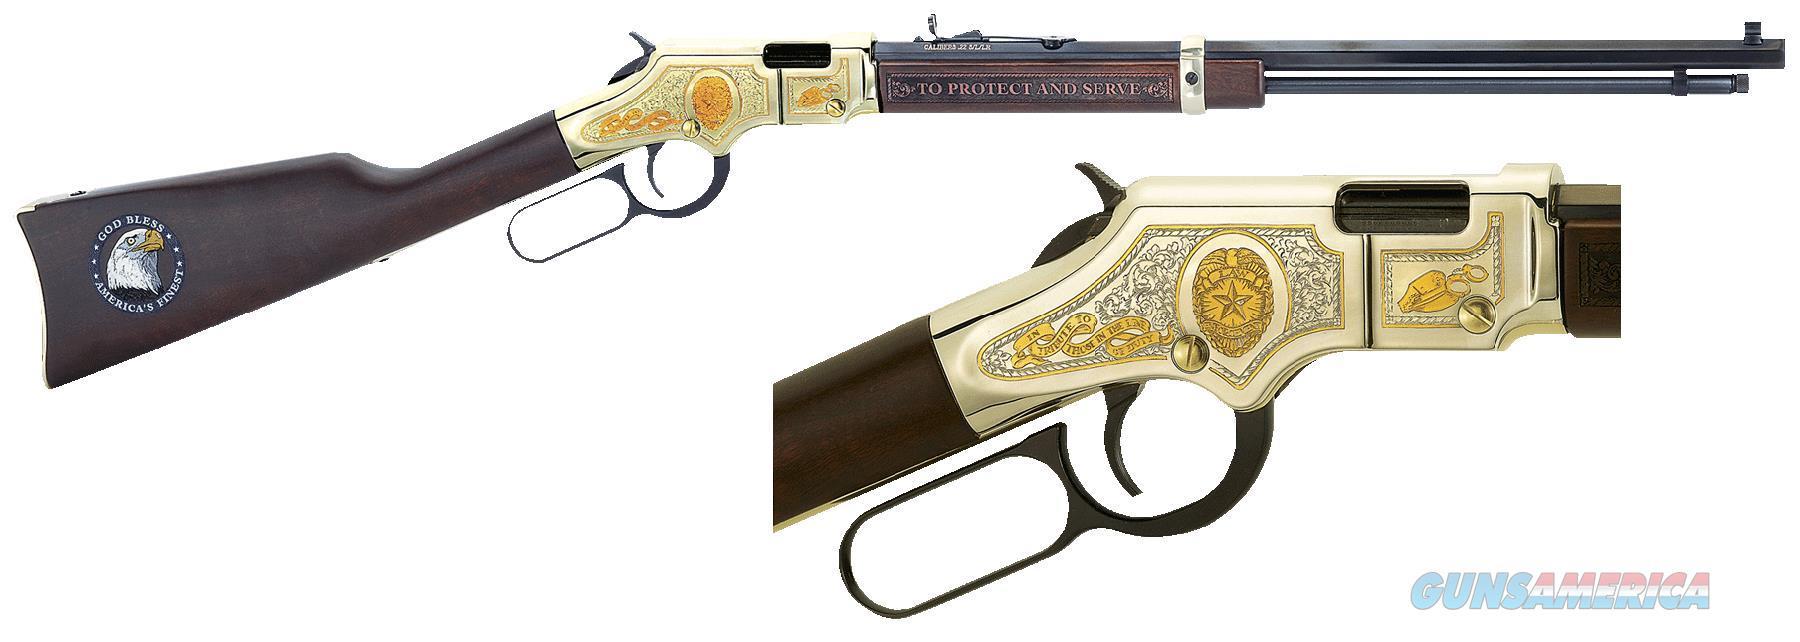 "Henry H004le Golden Boy Law Enforcement Tribute  Lever 22 Short/Long/Long Rifle 20"" 16 Lr/21 Short American Walnut Stk Nickel Receiver/Blued Barrel H004LE  Guns > Rifles > H Misc Rifles"